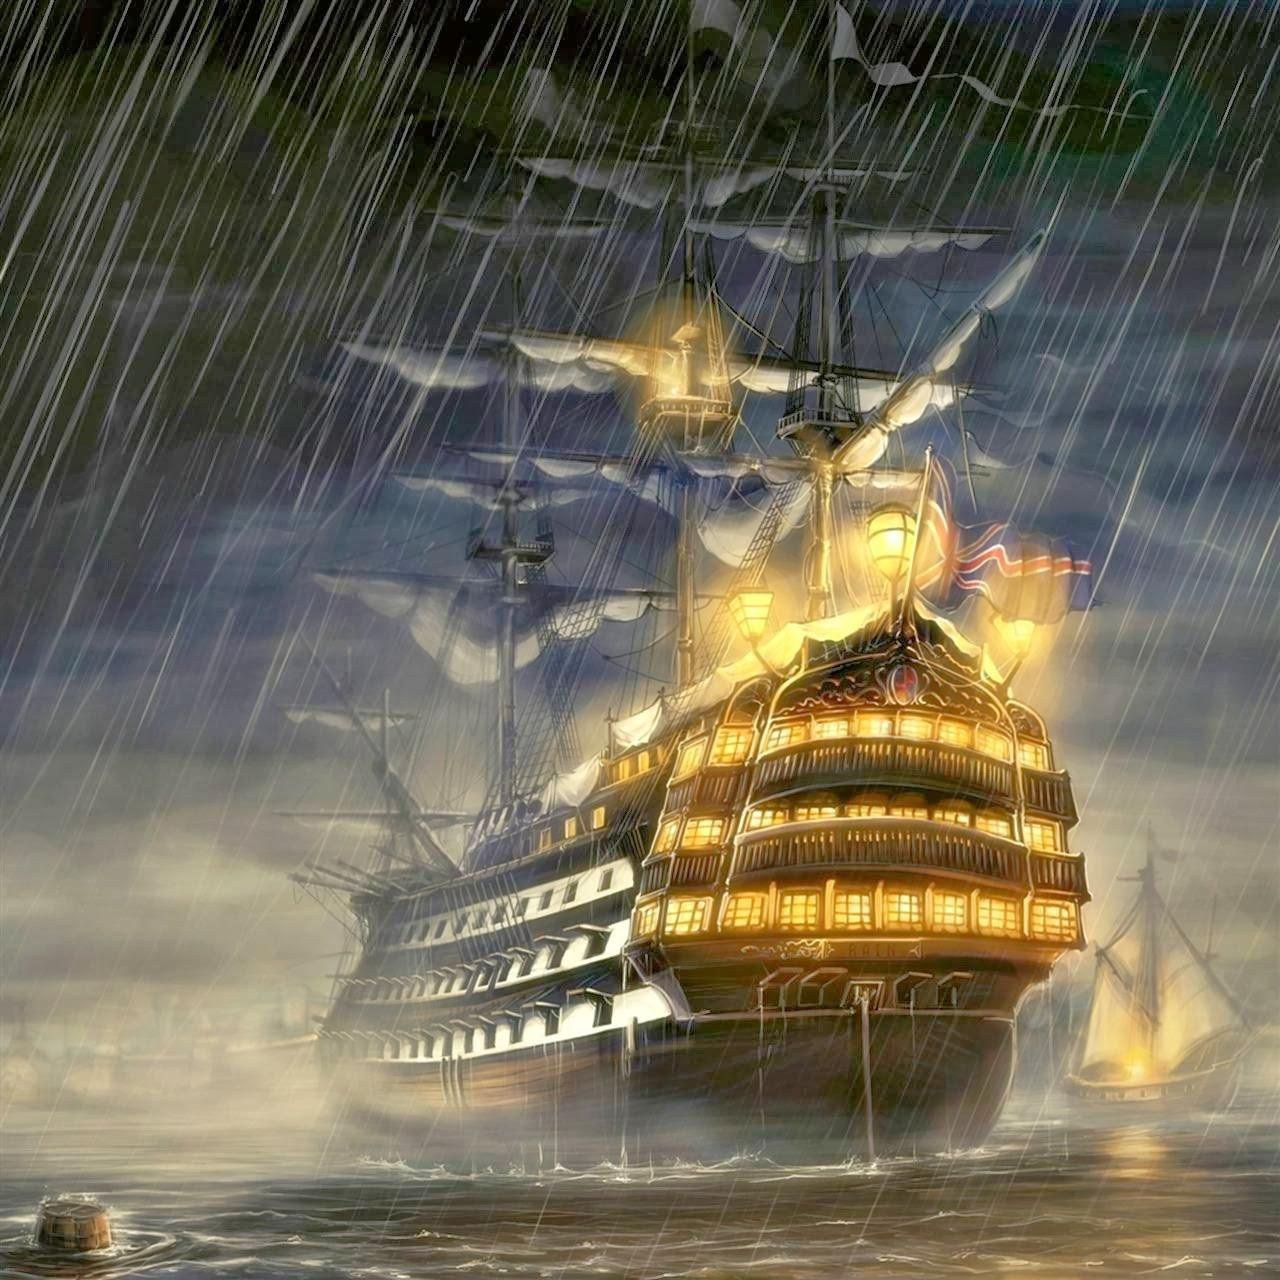 Pirates Of The Caribbean Wallpaper Hd: Pirate Ship Wallpaper HD